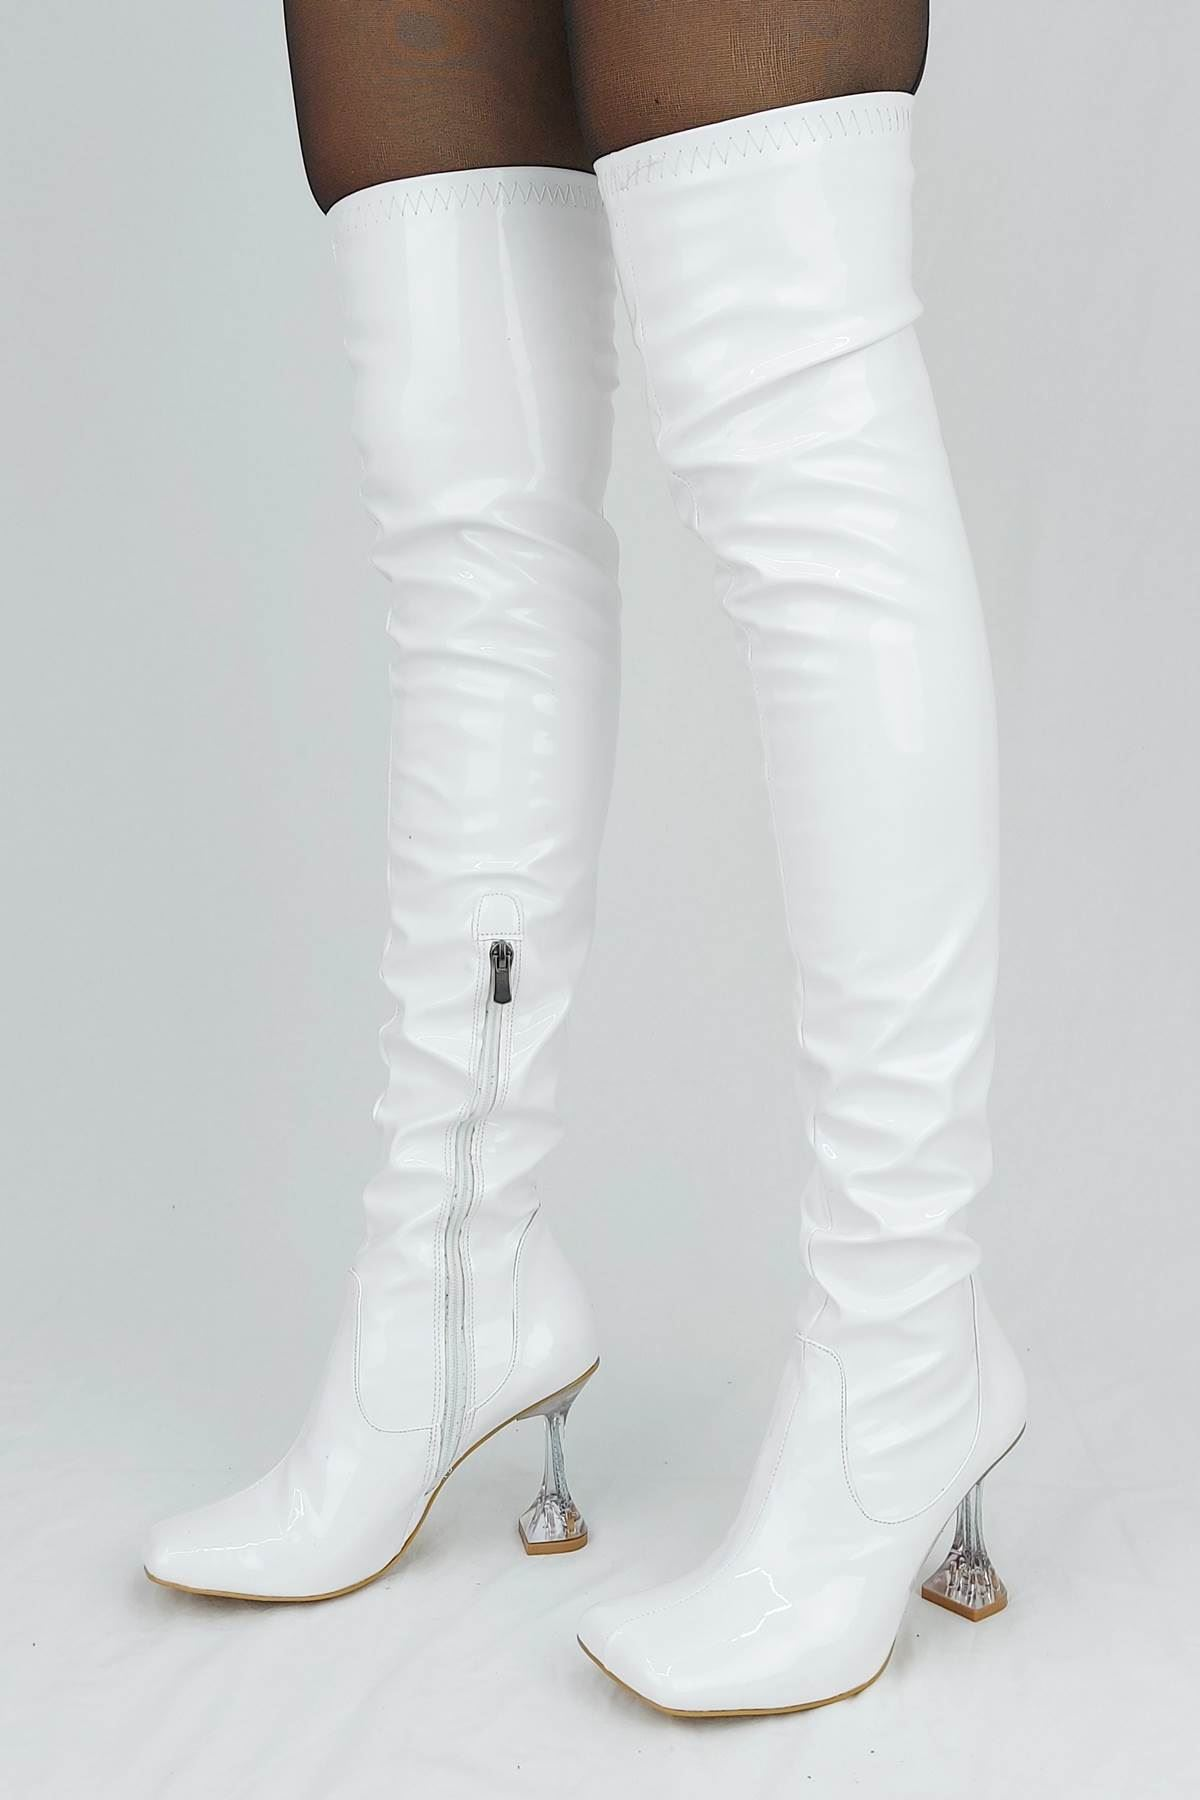 İvan Beyaz Cilt Fashion Topuklu Diz Üstü Çizme